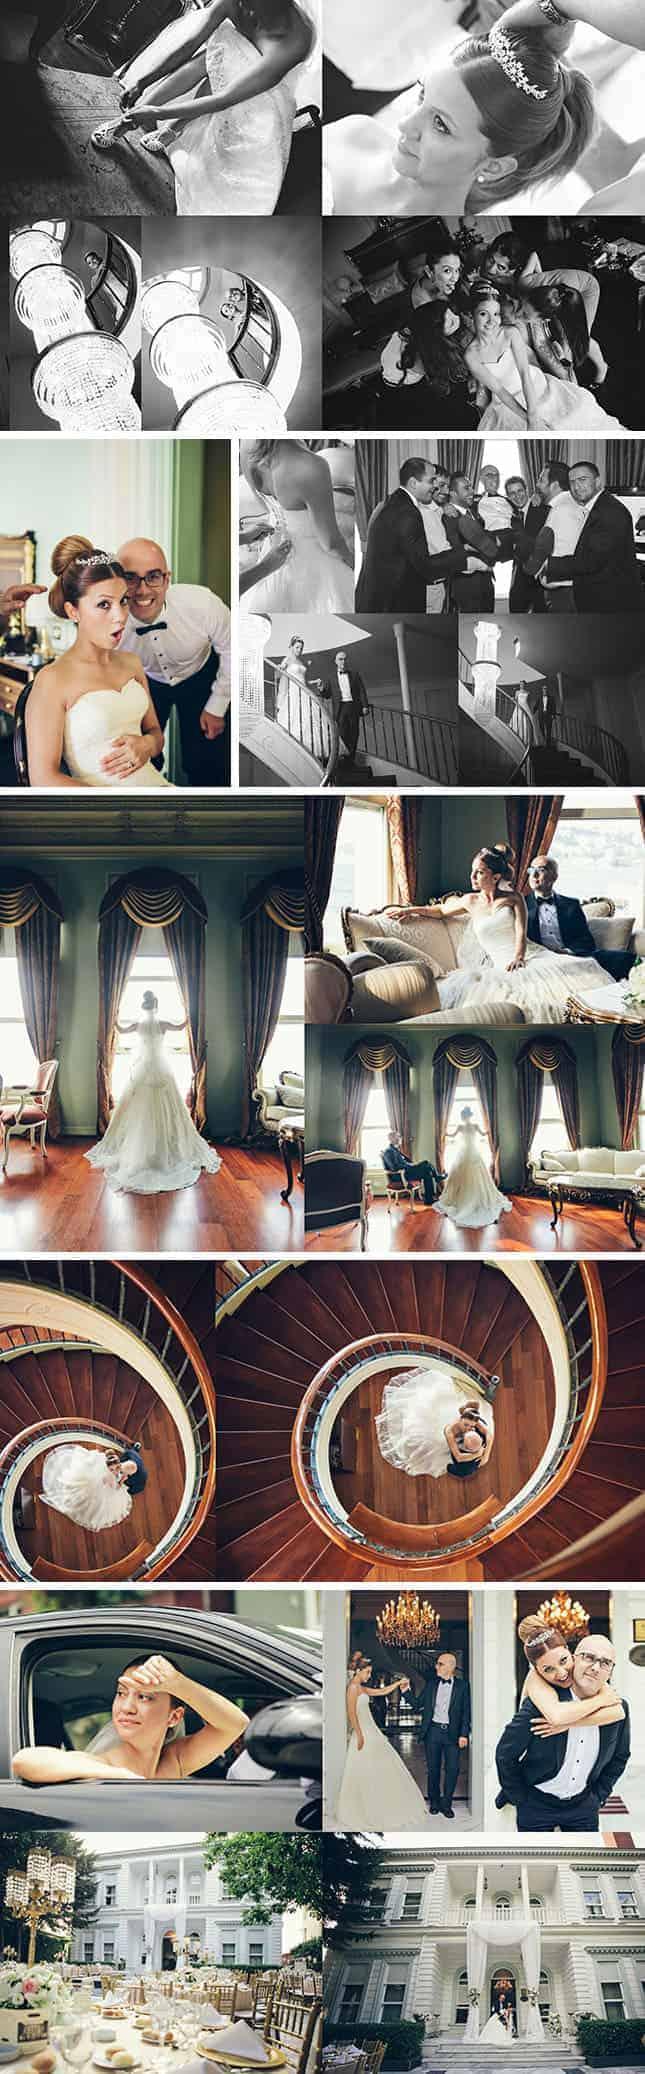 thras_the_dress_fotograflari_001 copy